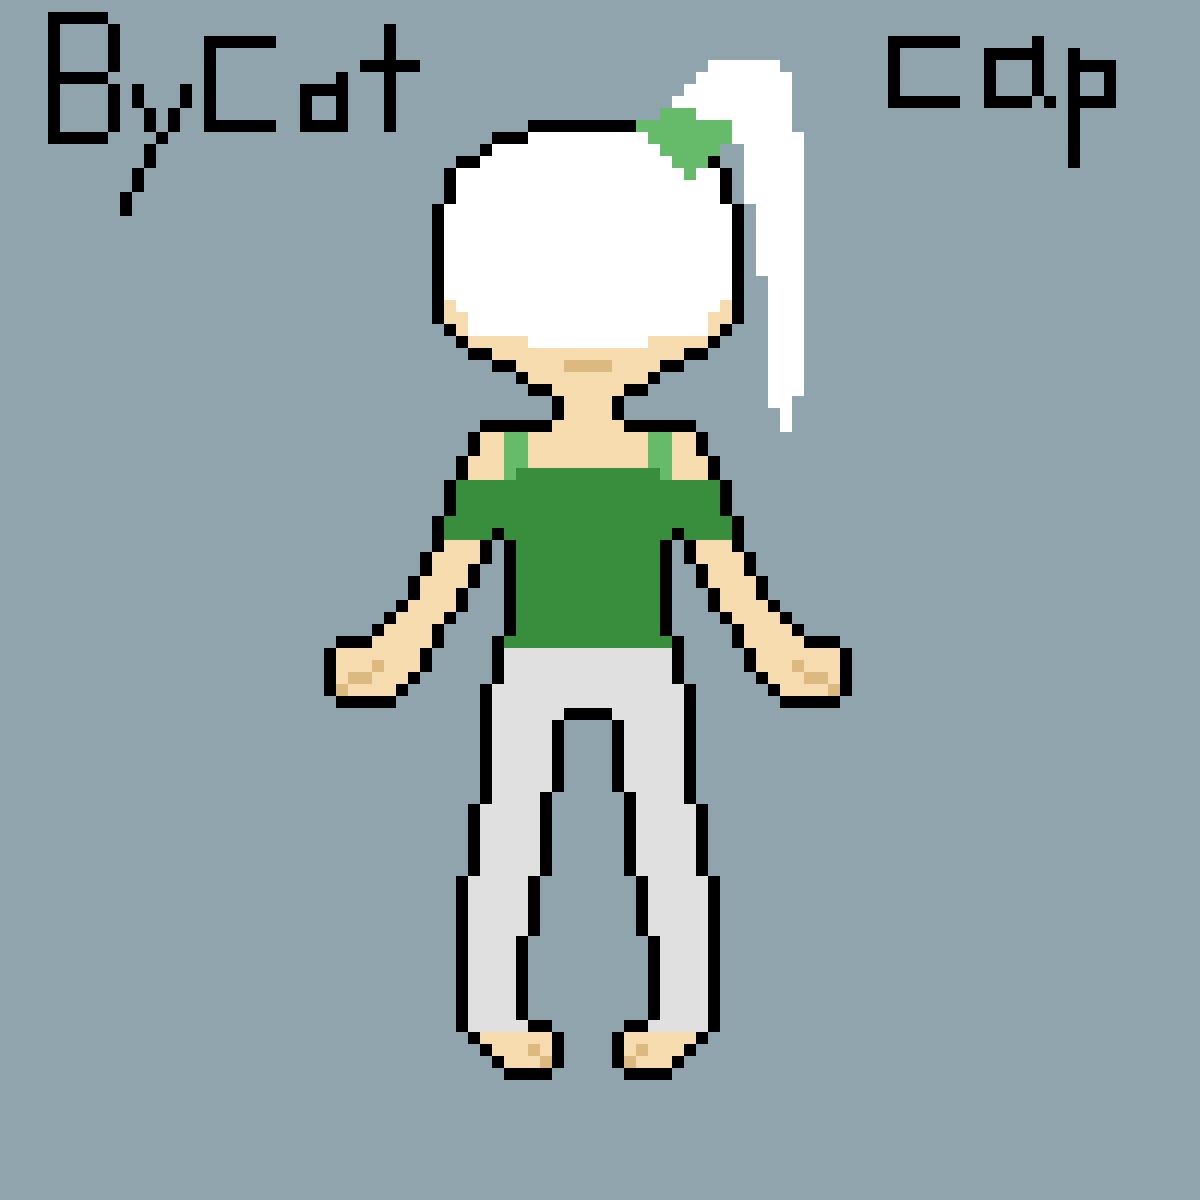 main-image-cap as a girl